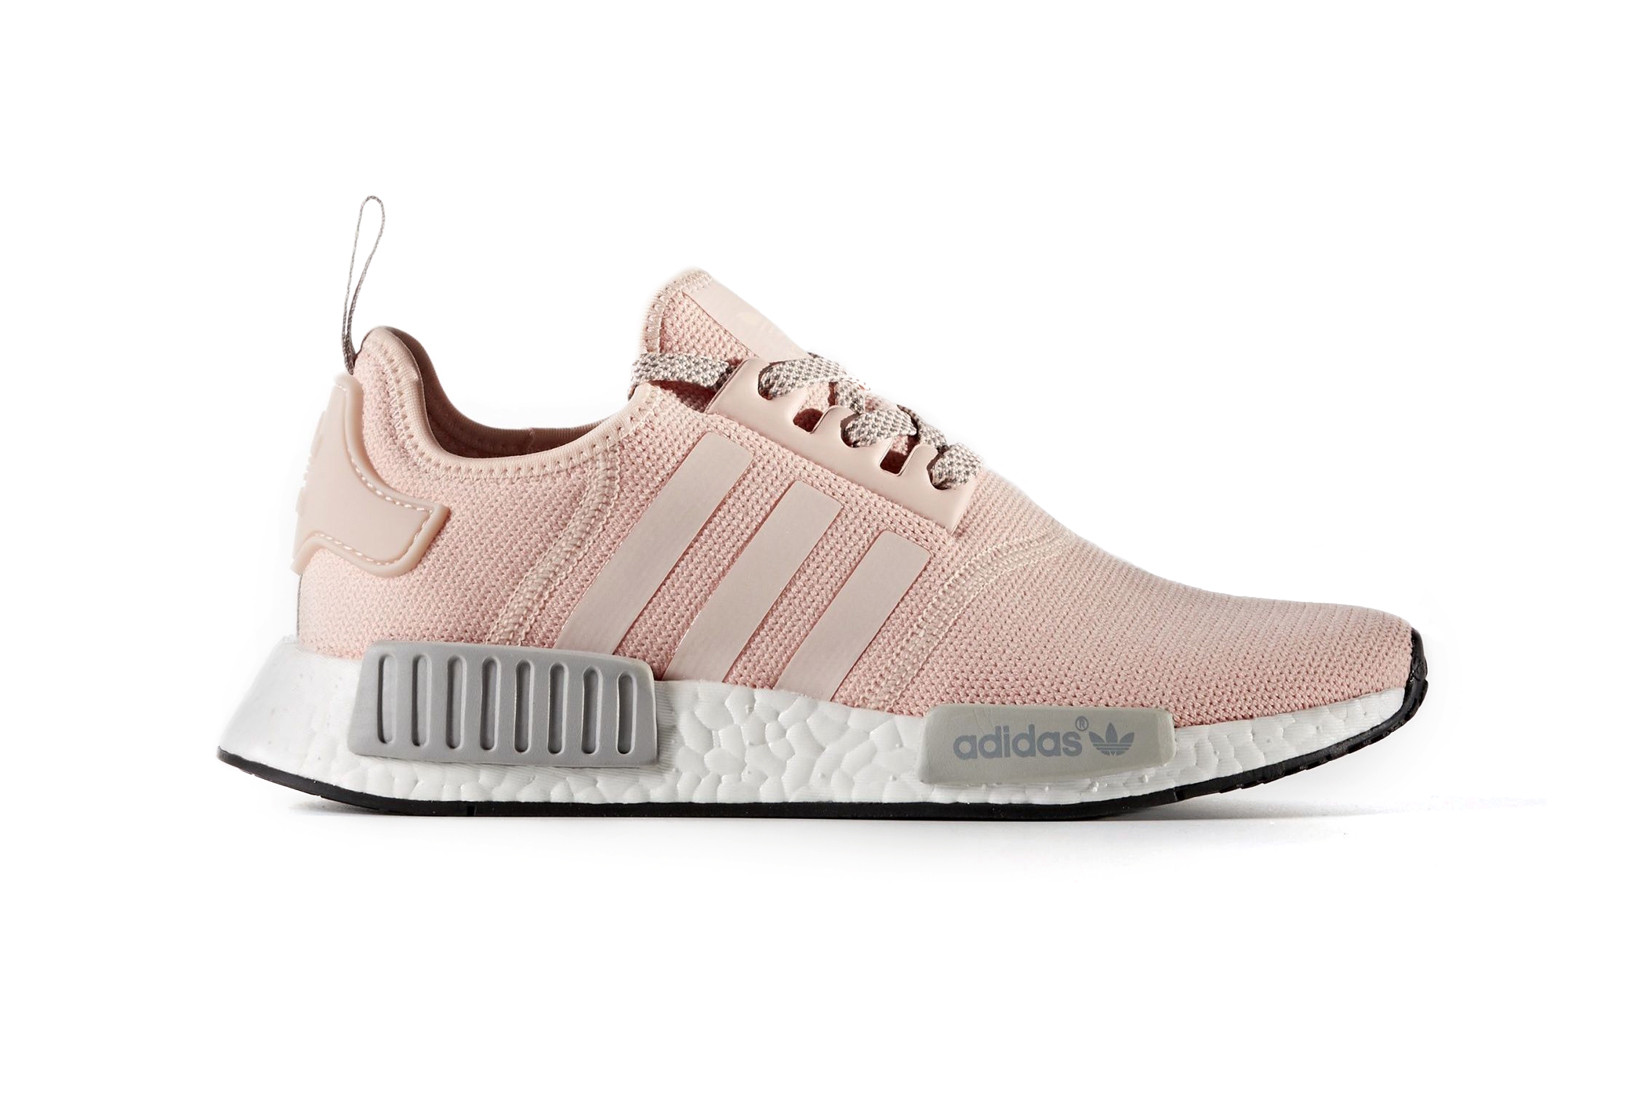 NMD_R1 Pink Grey